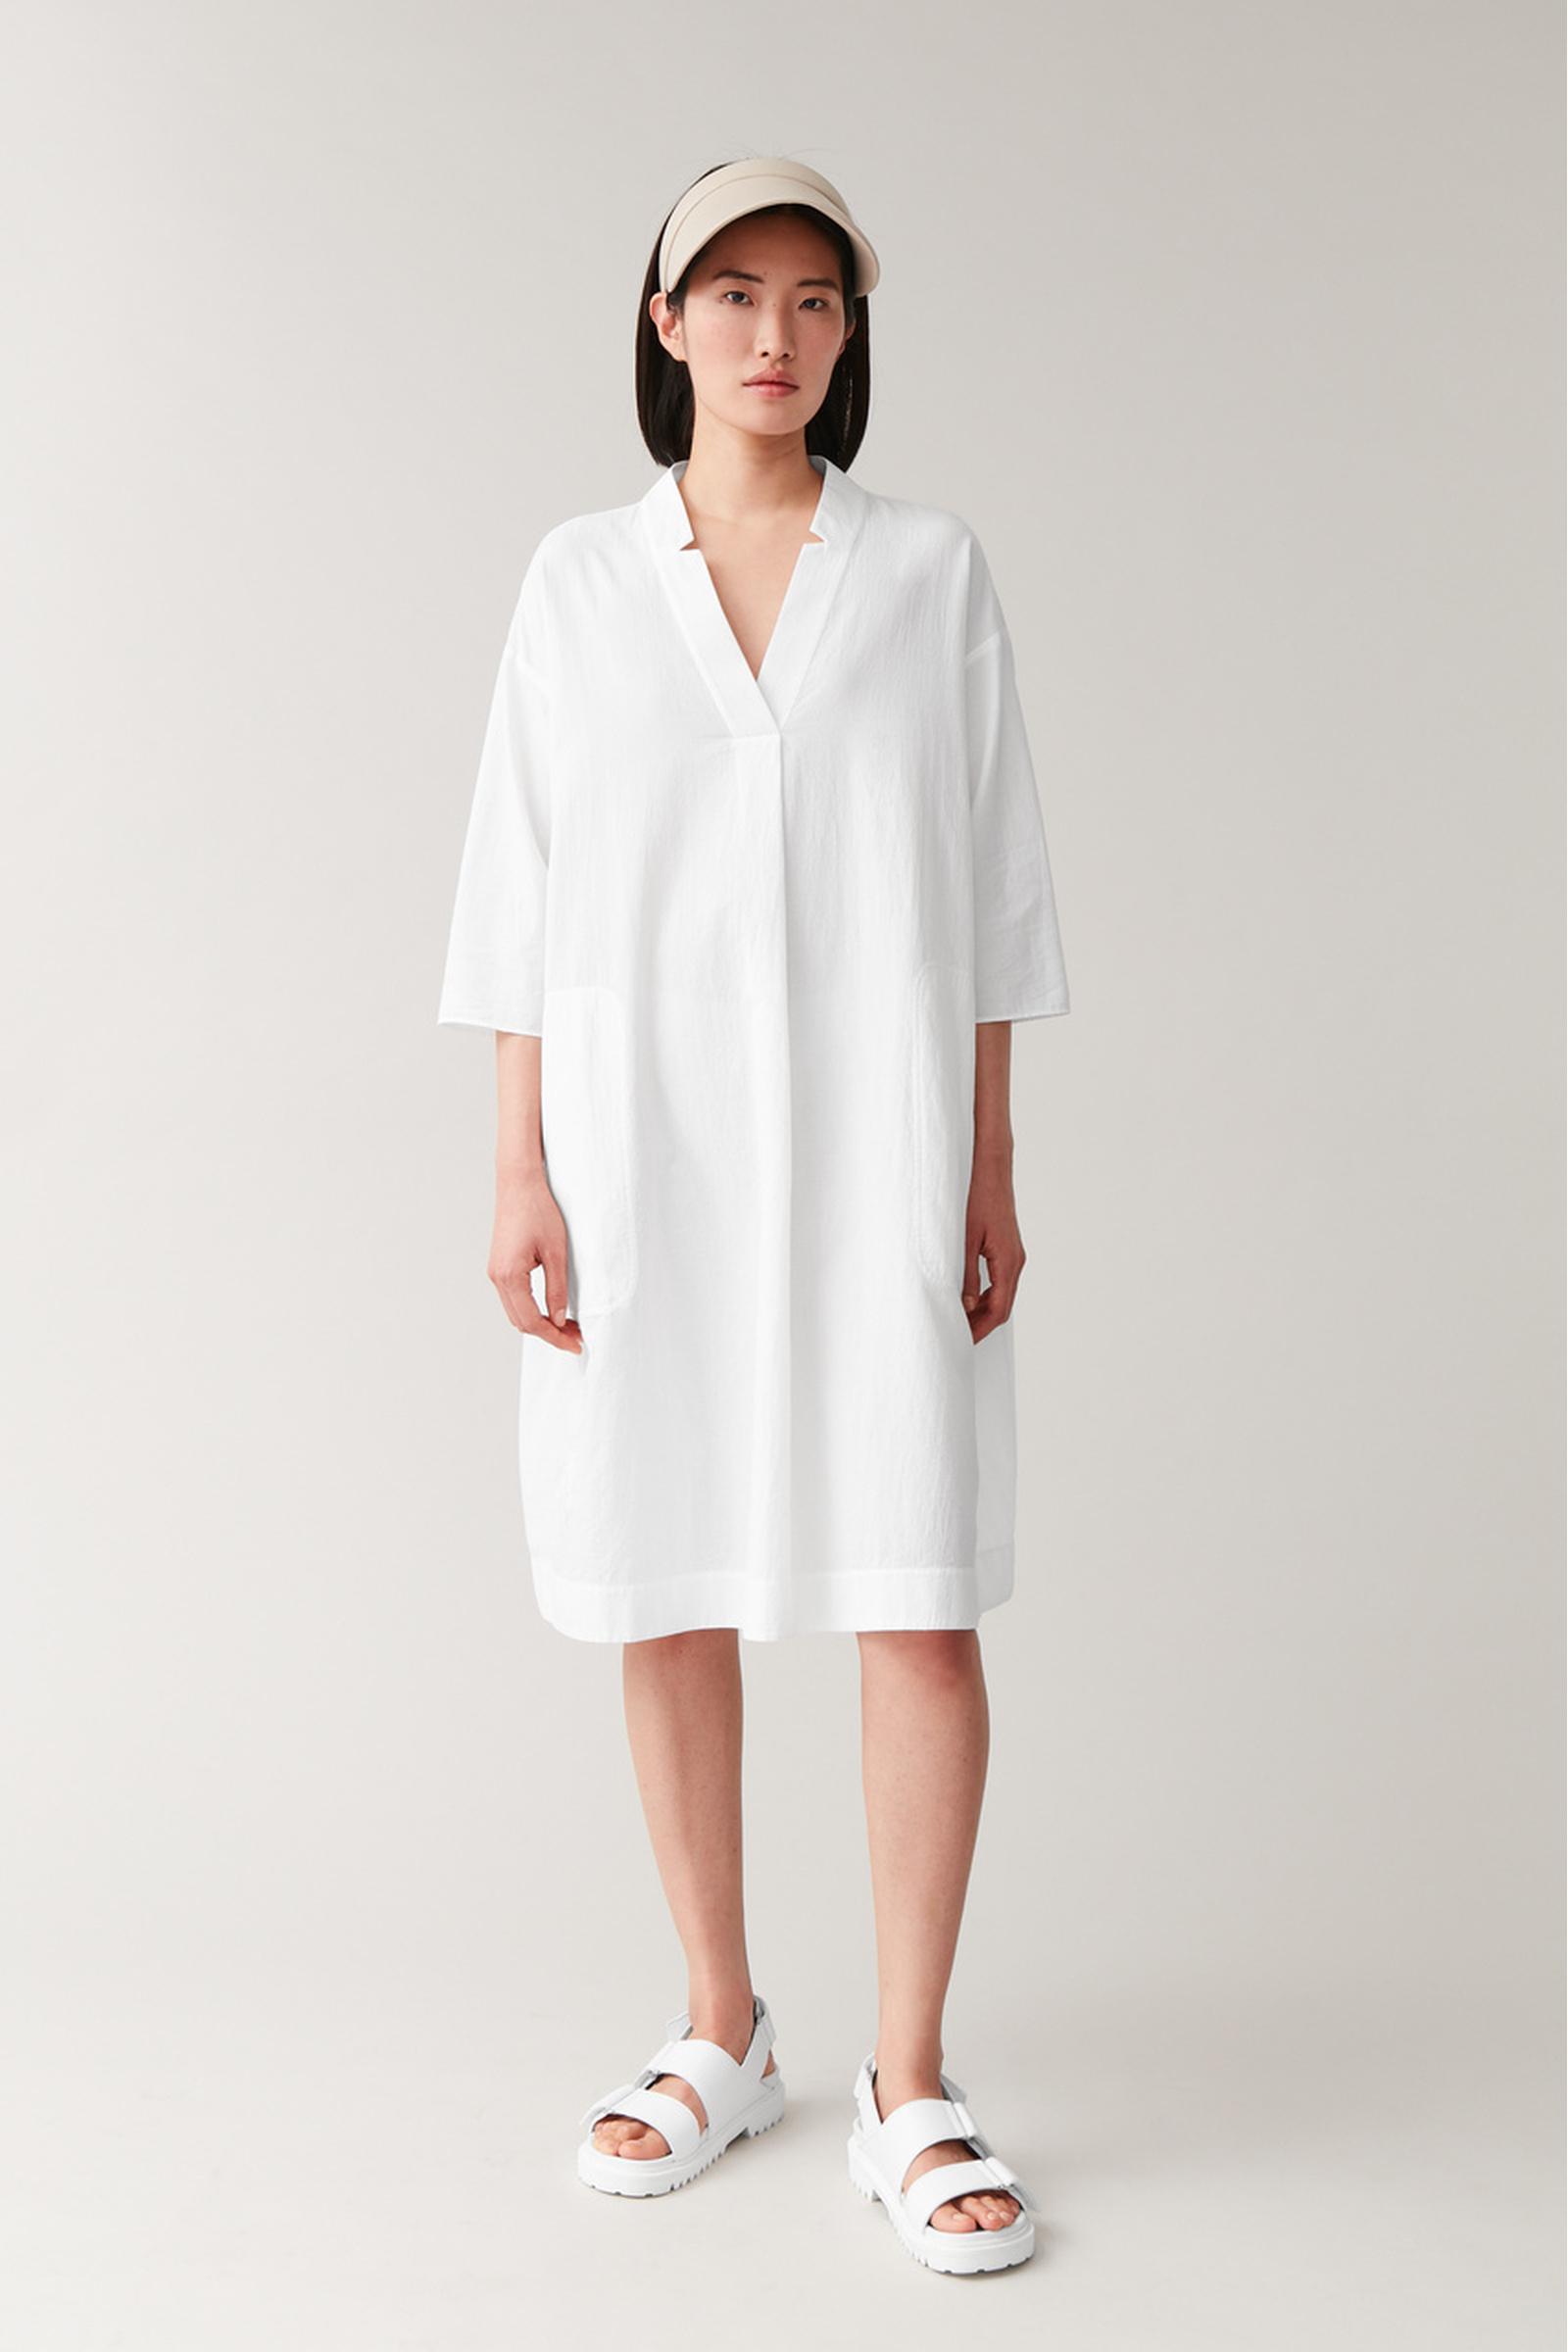 COS 볼류미너스 코튼 셔츠 드레스의 화이트컬러 ECOMLook입니다.